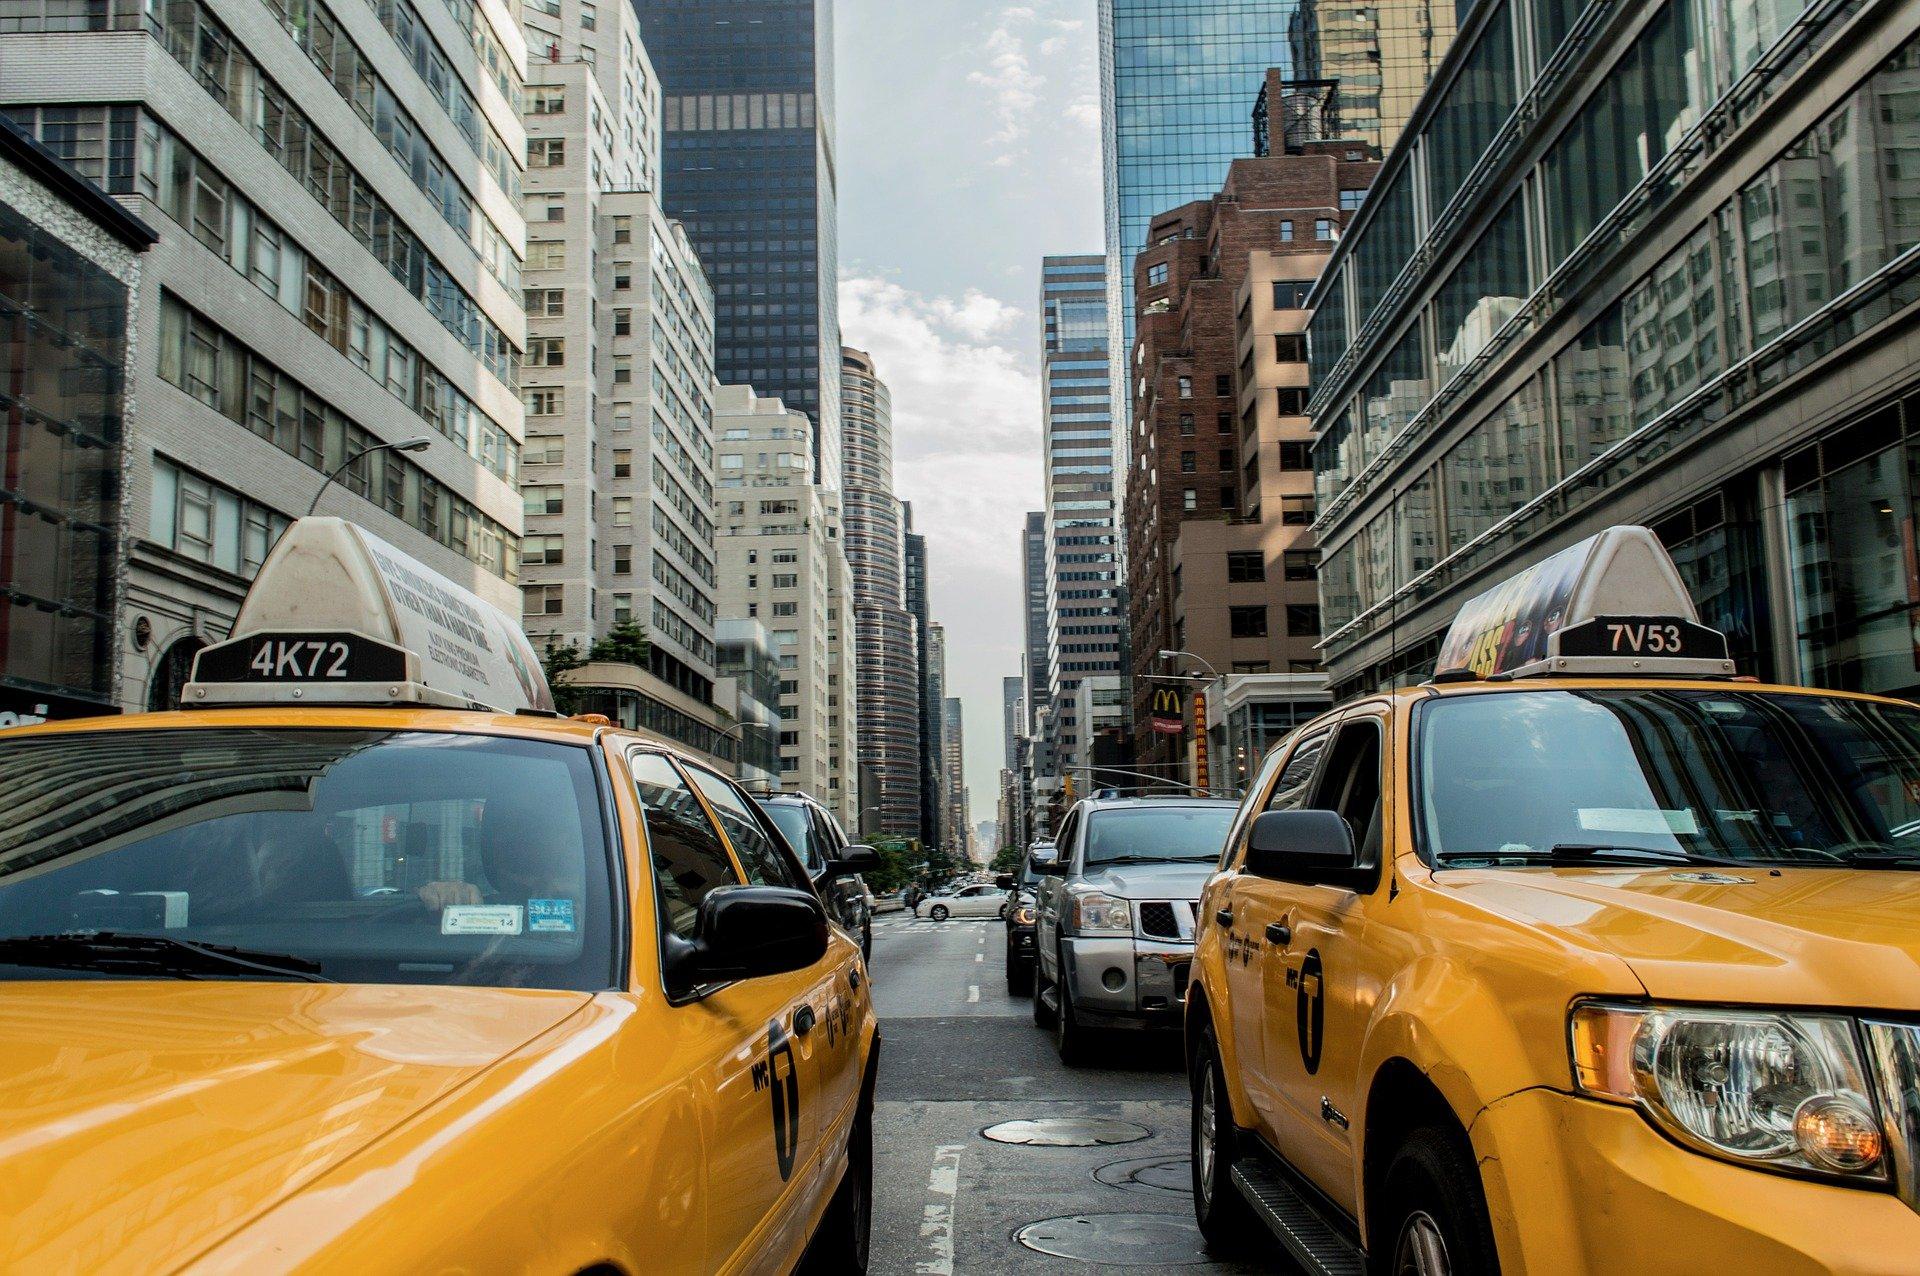 как найти клиентов такси